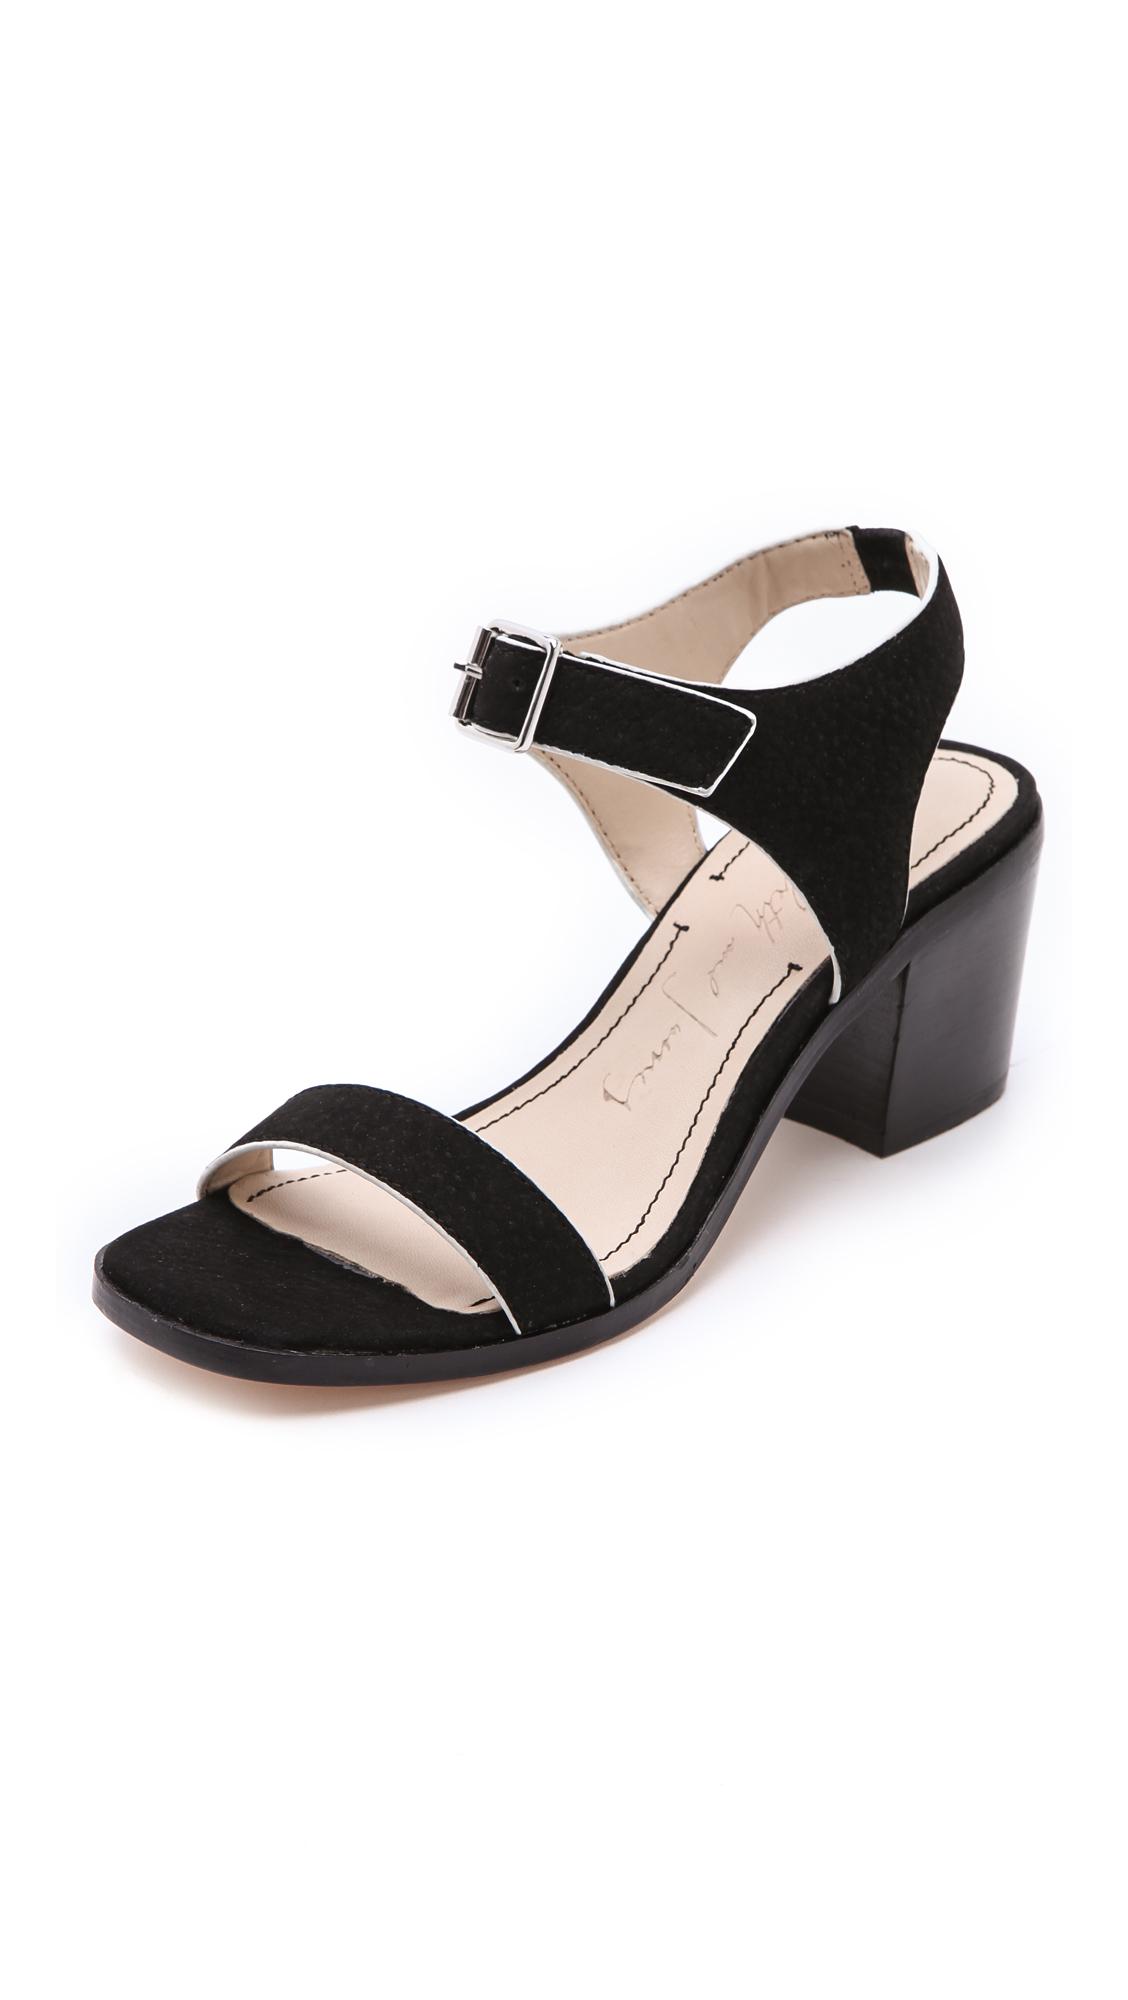 Unique Womens Black Low Heel Ghillie Sandals  Peacocks